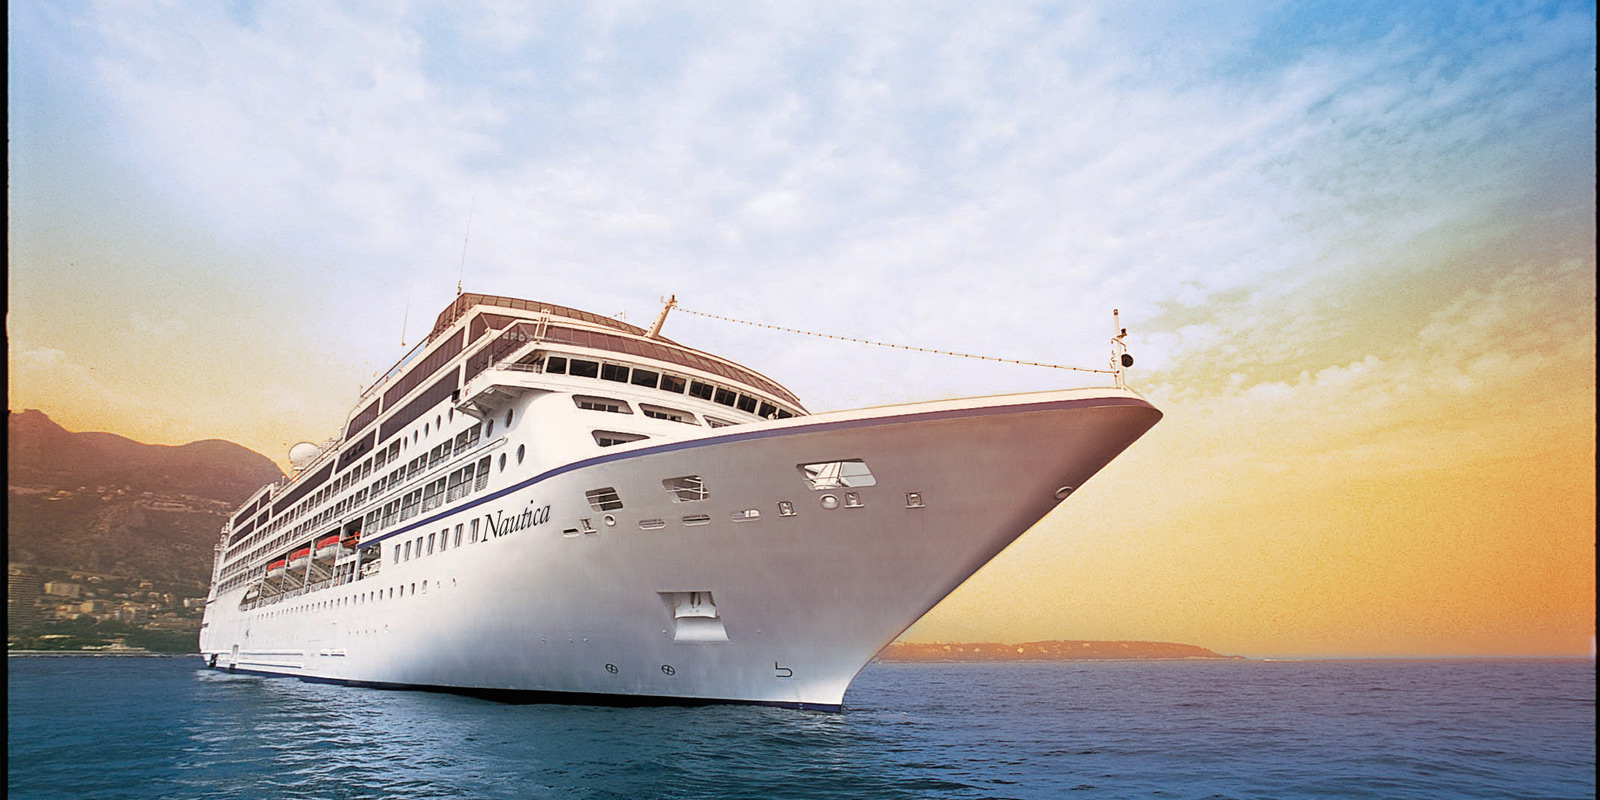 Kryssningsfartyget Oceania NAutica